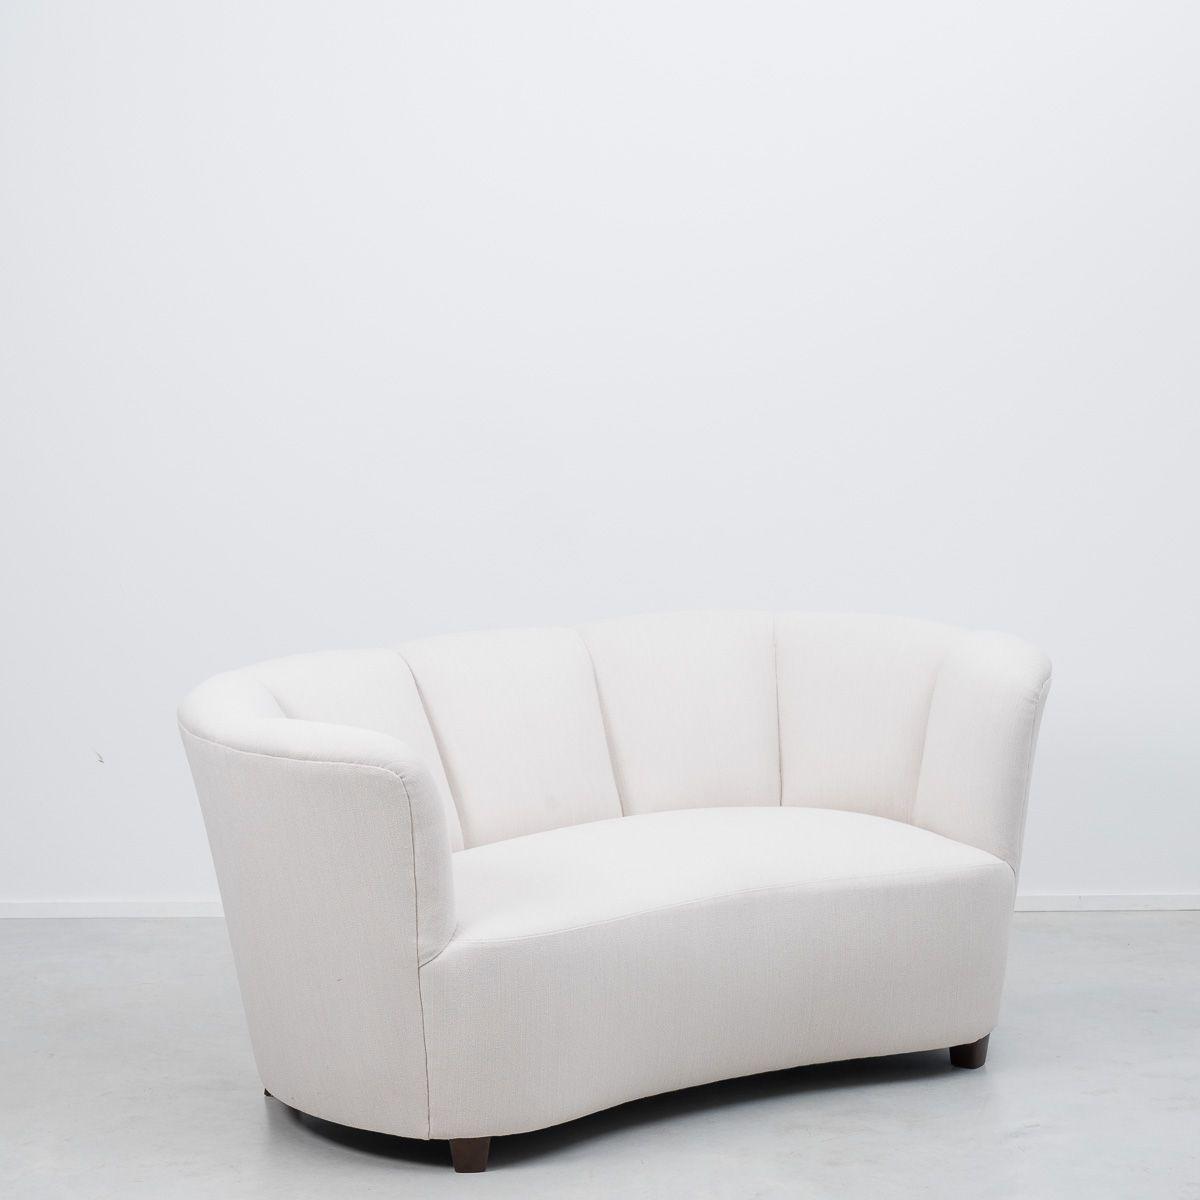 d nisches banana sofa 1940er bei pamono kaufen. Black Bedroom Furniture Sets. Home Design Ideas